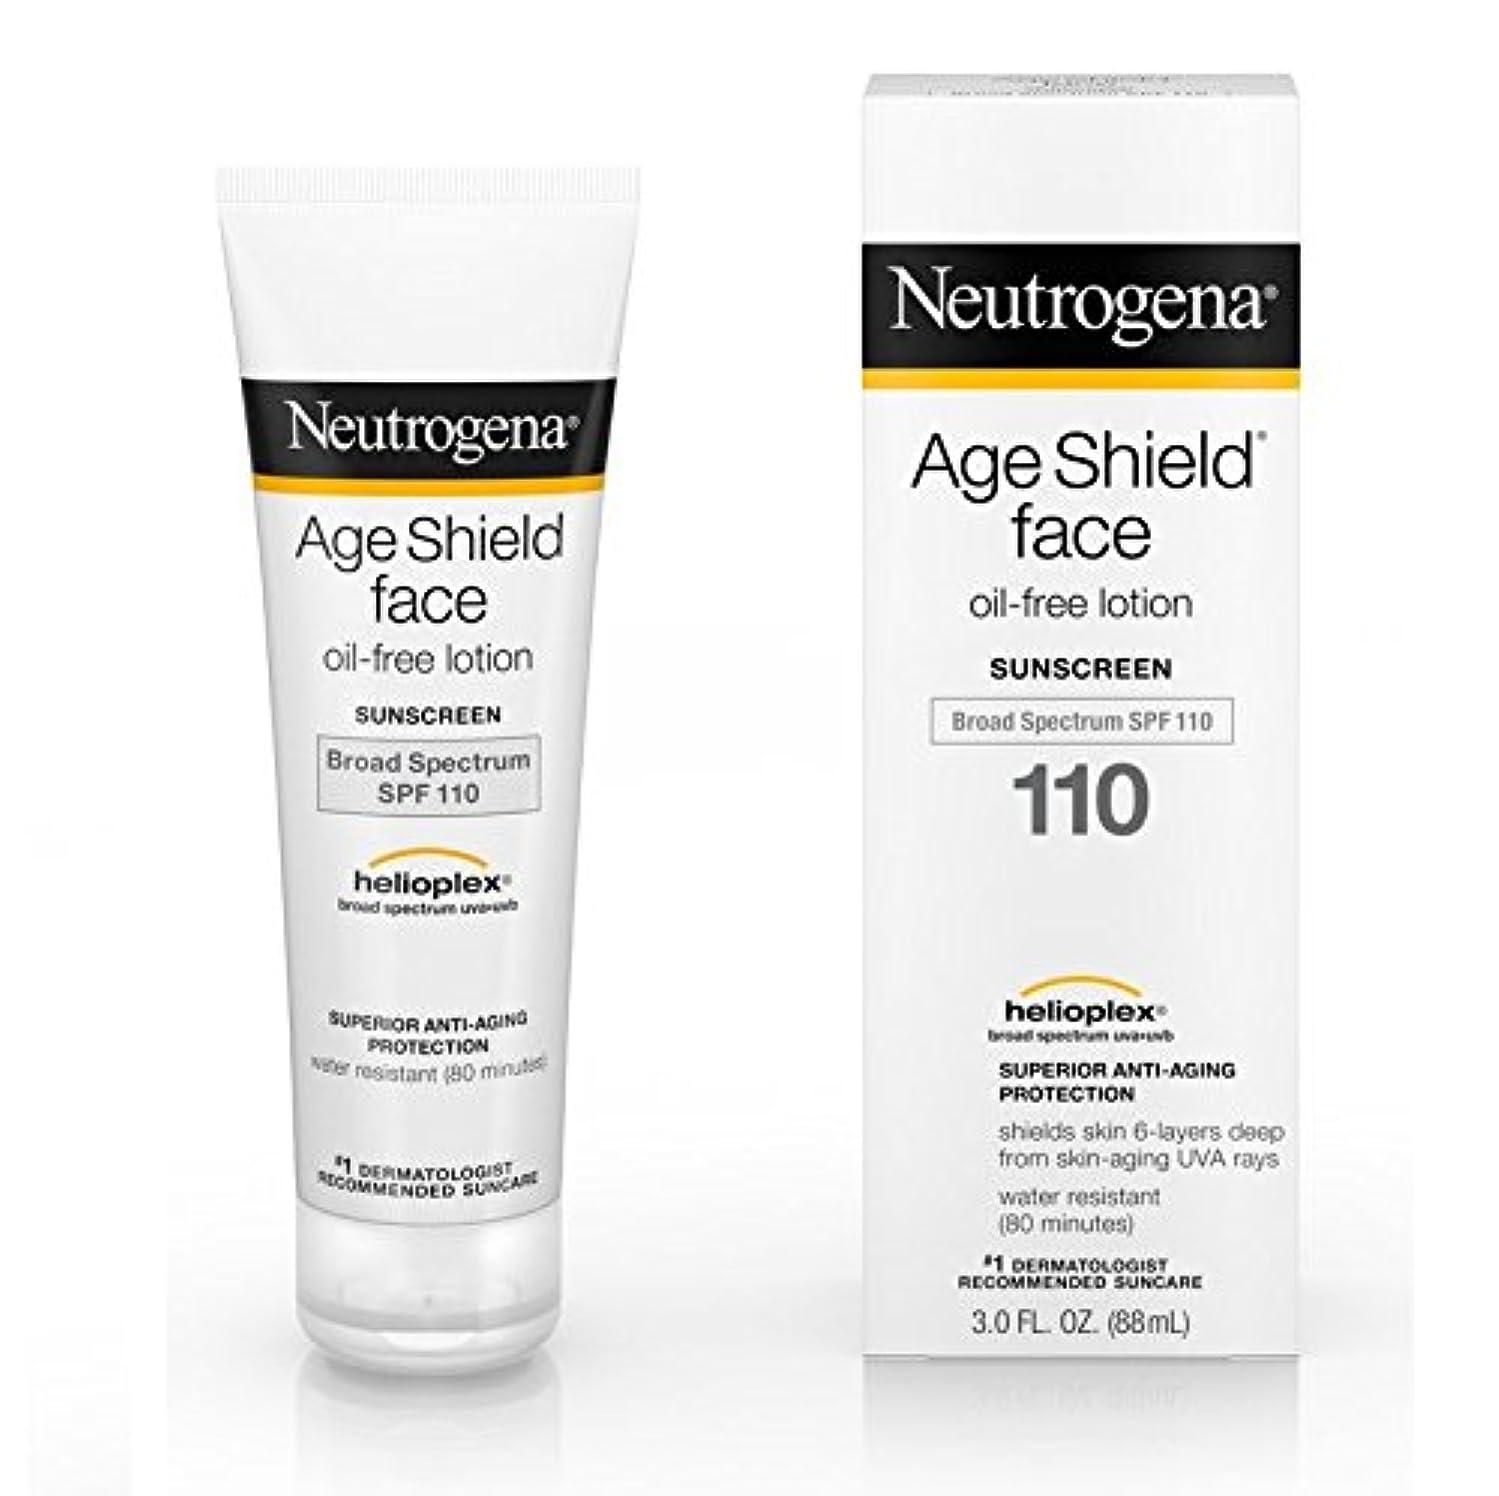 鎖荒野強打【海外直送品】Neutrogena Age Shield® Face Oil-Free Lotion Sunscreen Broad Spectrum SPF 110 - 3 FL OZ(88ml)